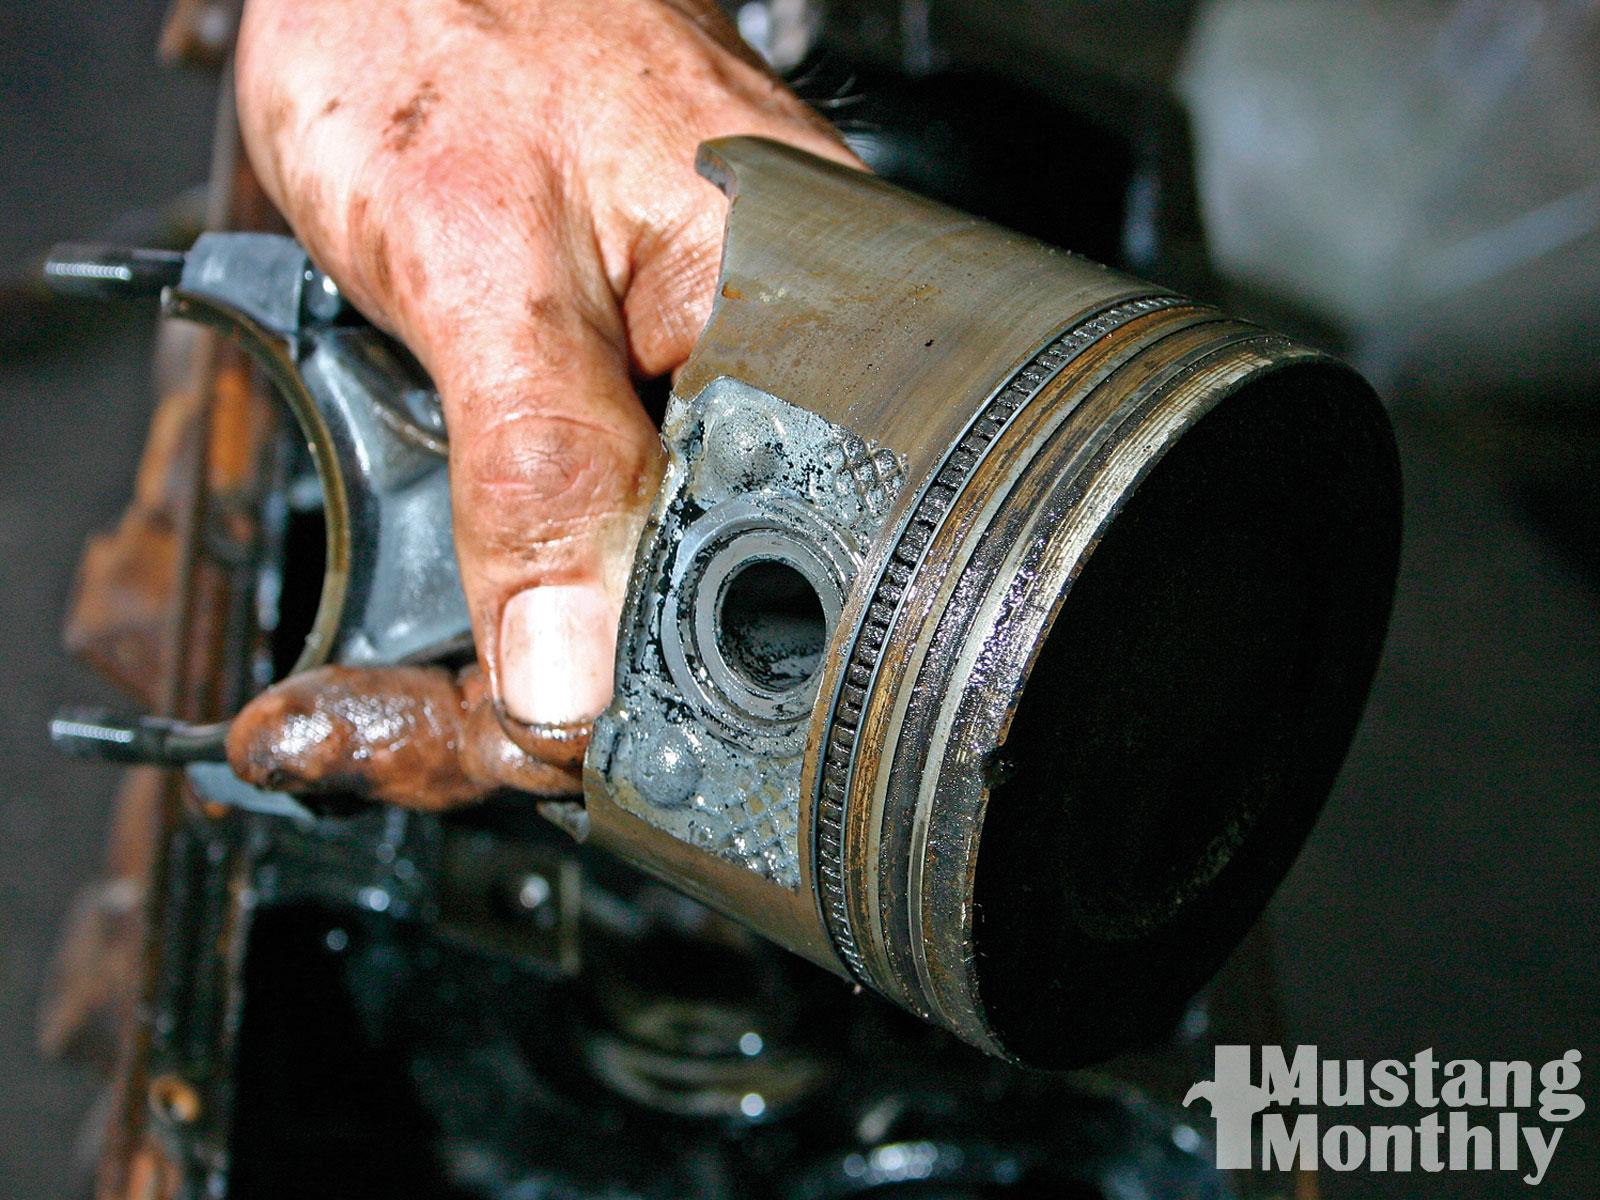 Mump 1004 06 O Mustang Oil Analysis Pistons And Rings